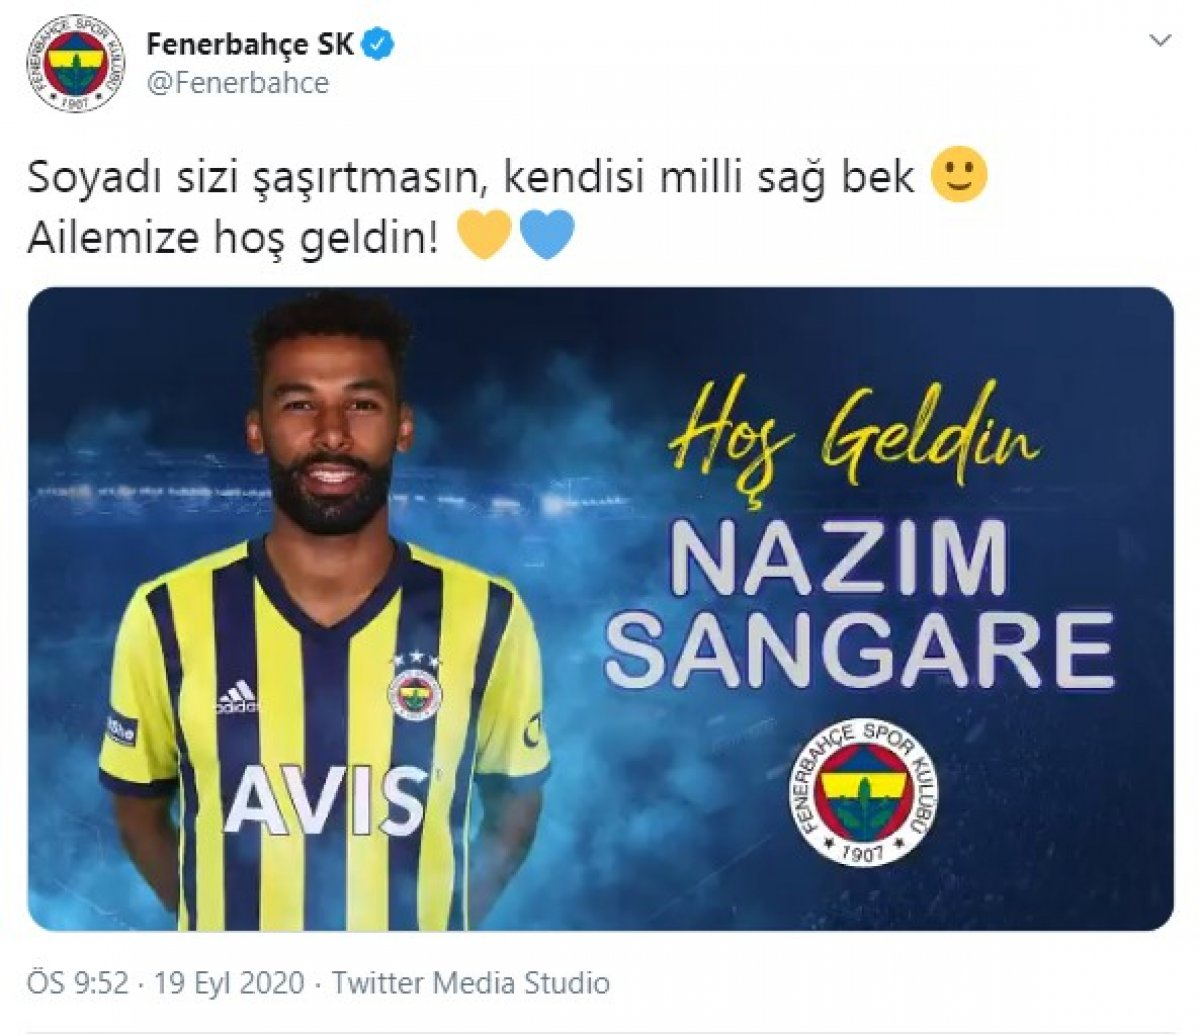 Nazım Sangare Fenerbahçe de #1